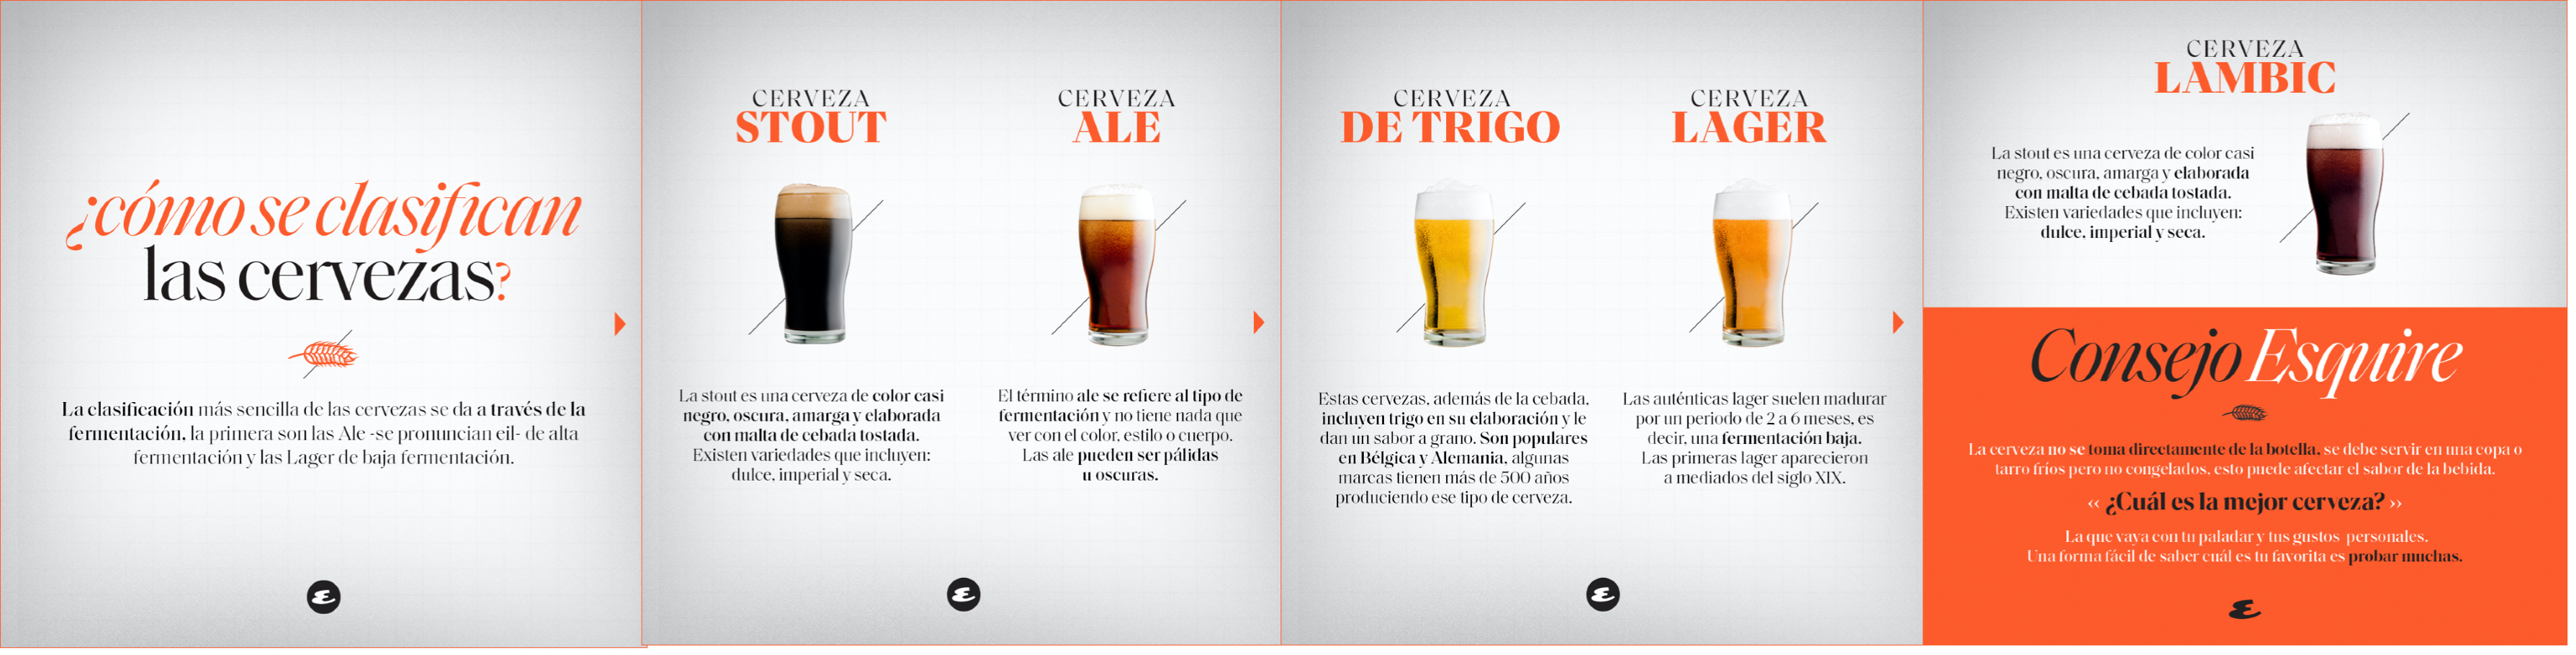 tipos de cerveza infografía cerveza